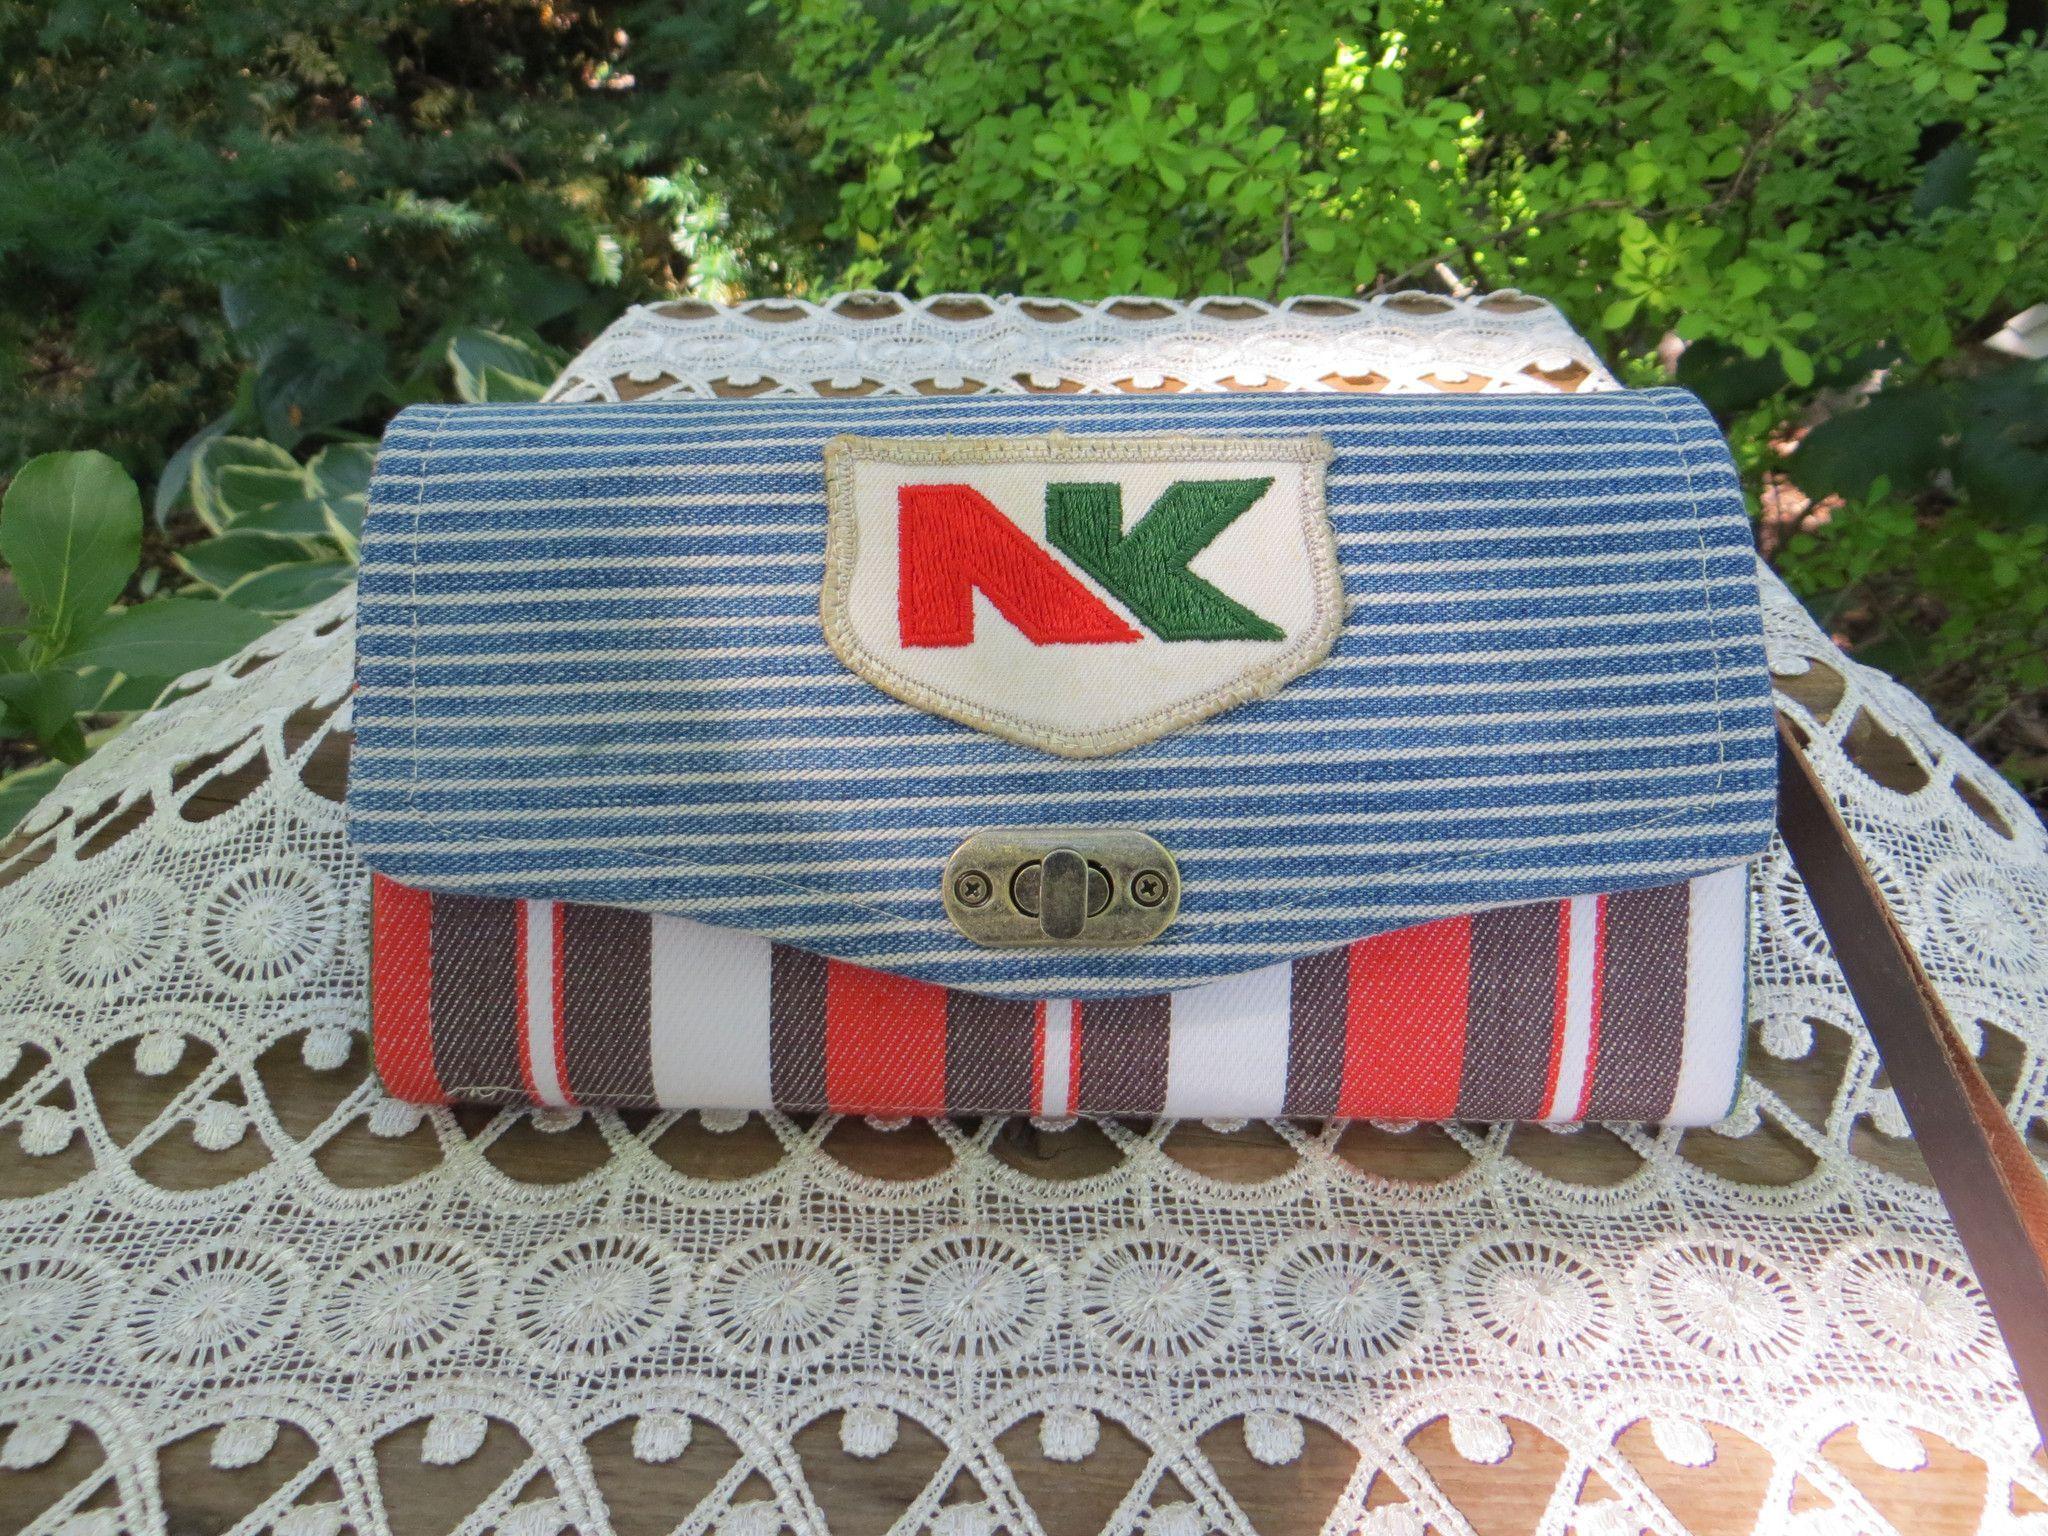 Wallet - Northrup King Vintage Patch